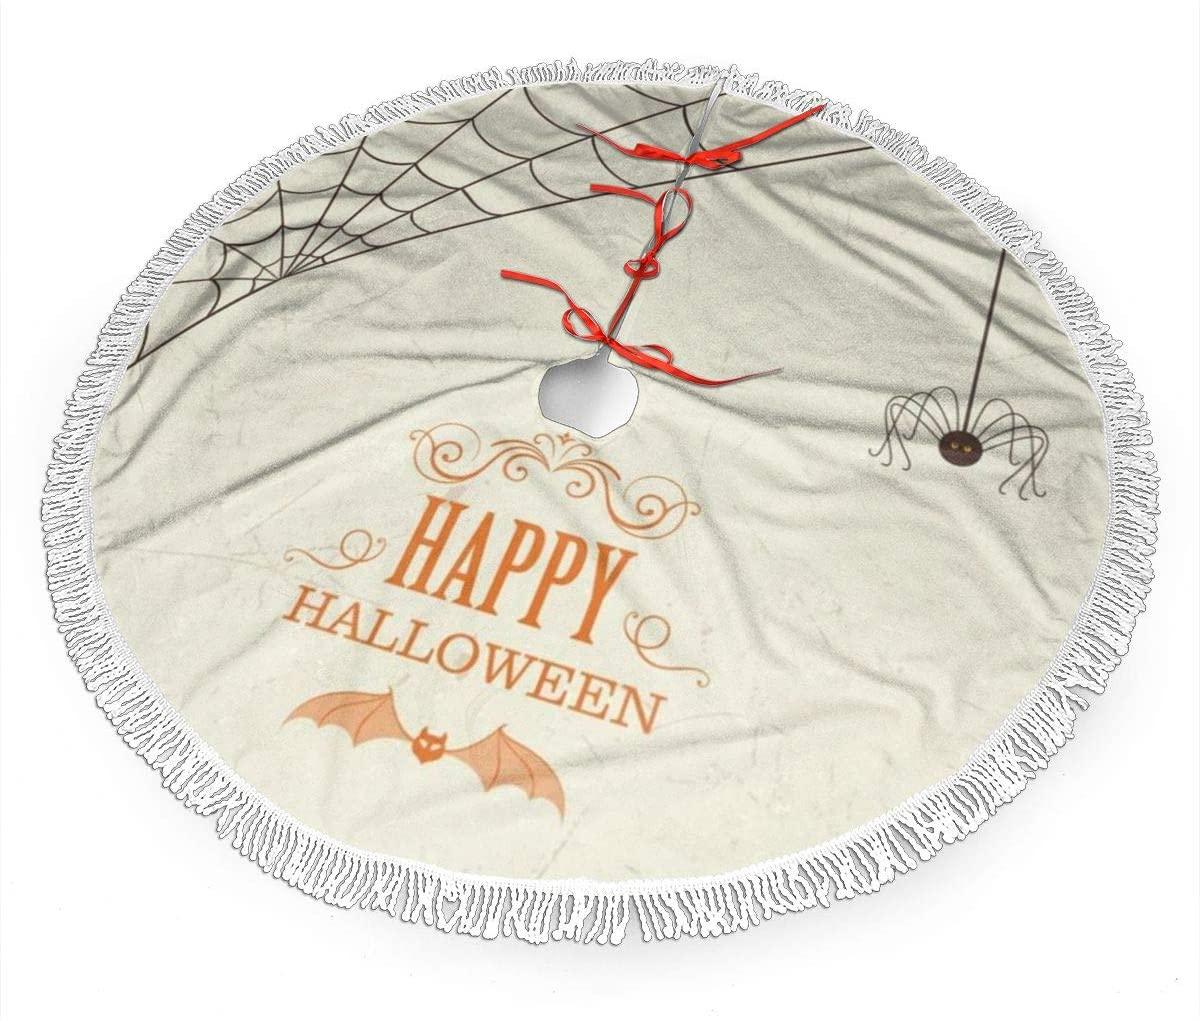 N\ A Christmastree Skirt,30 inches Halloween Retro Happy Halloween Bat Hanging Spider Web Hand-Sewn White Lace Decor Xmas Tree Skirt